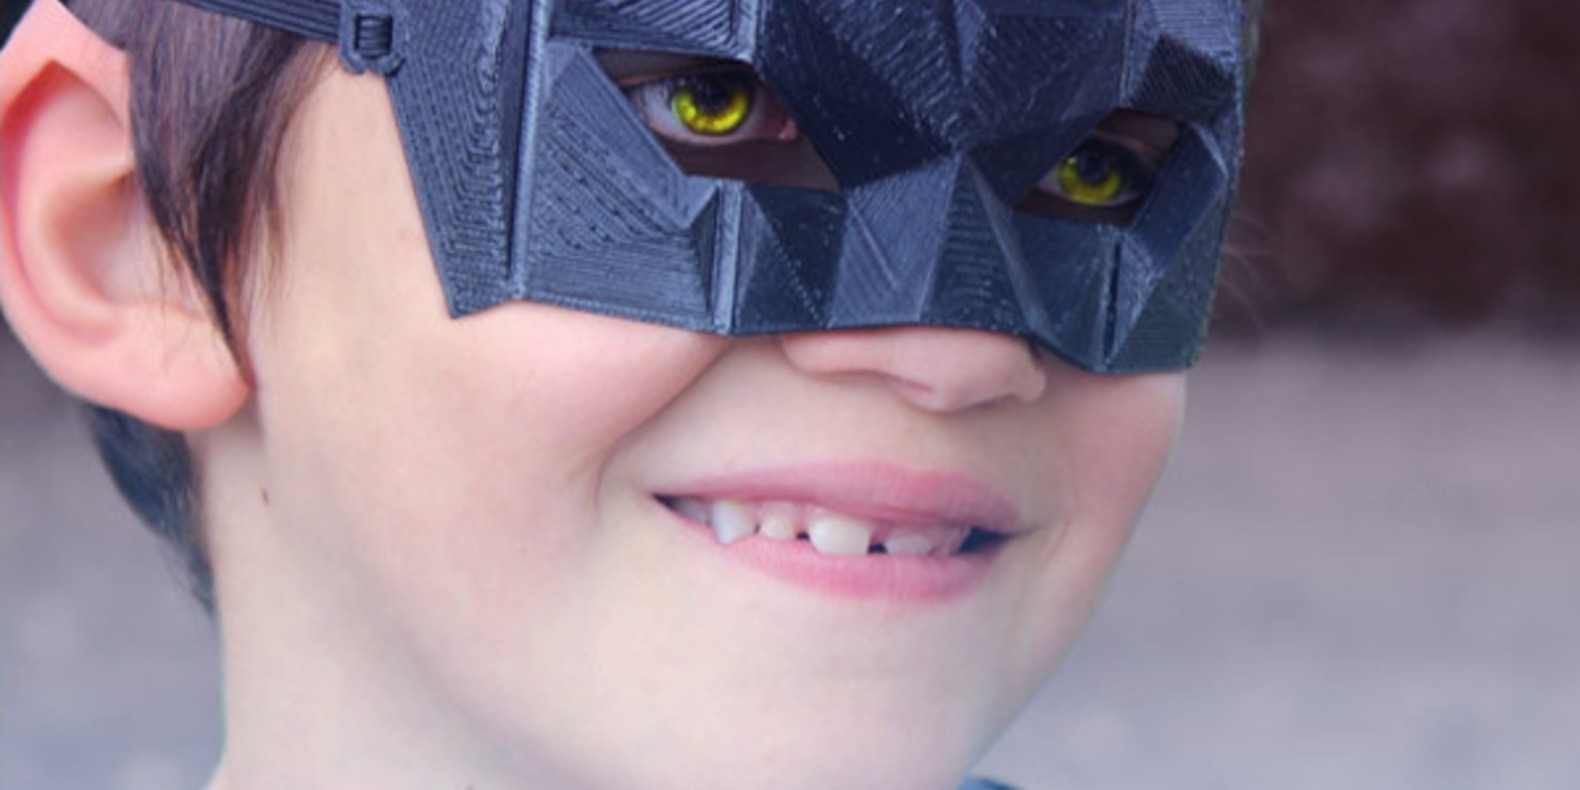 17.Masque-Mageli jouets imprimés en 3D